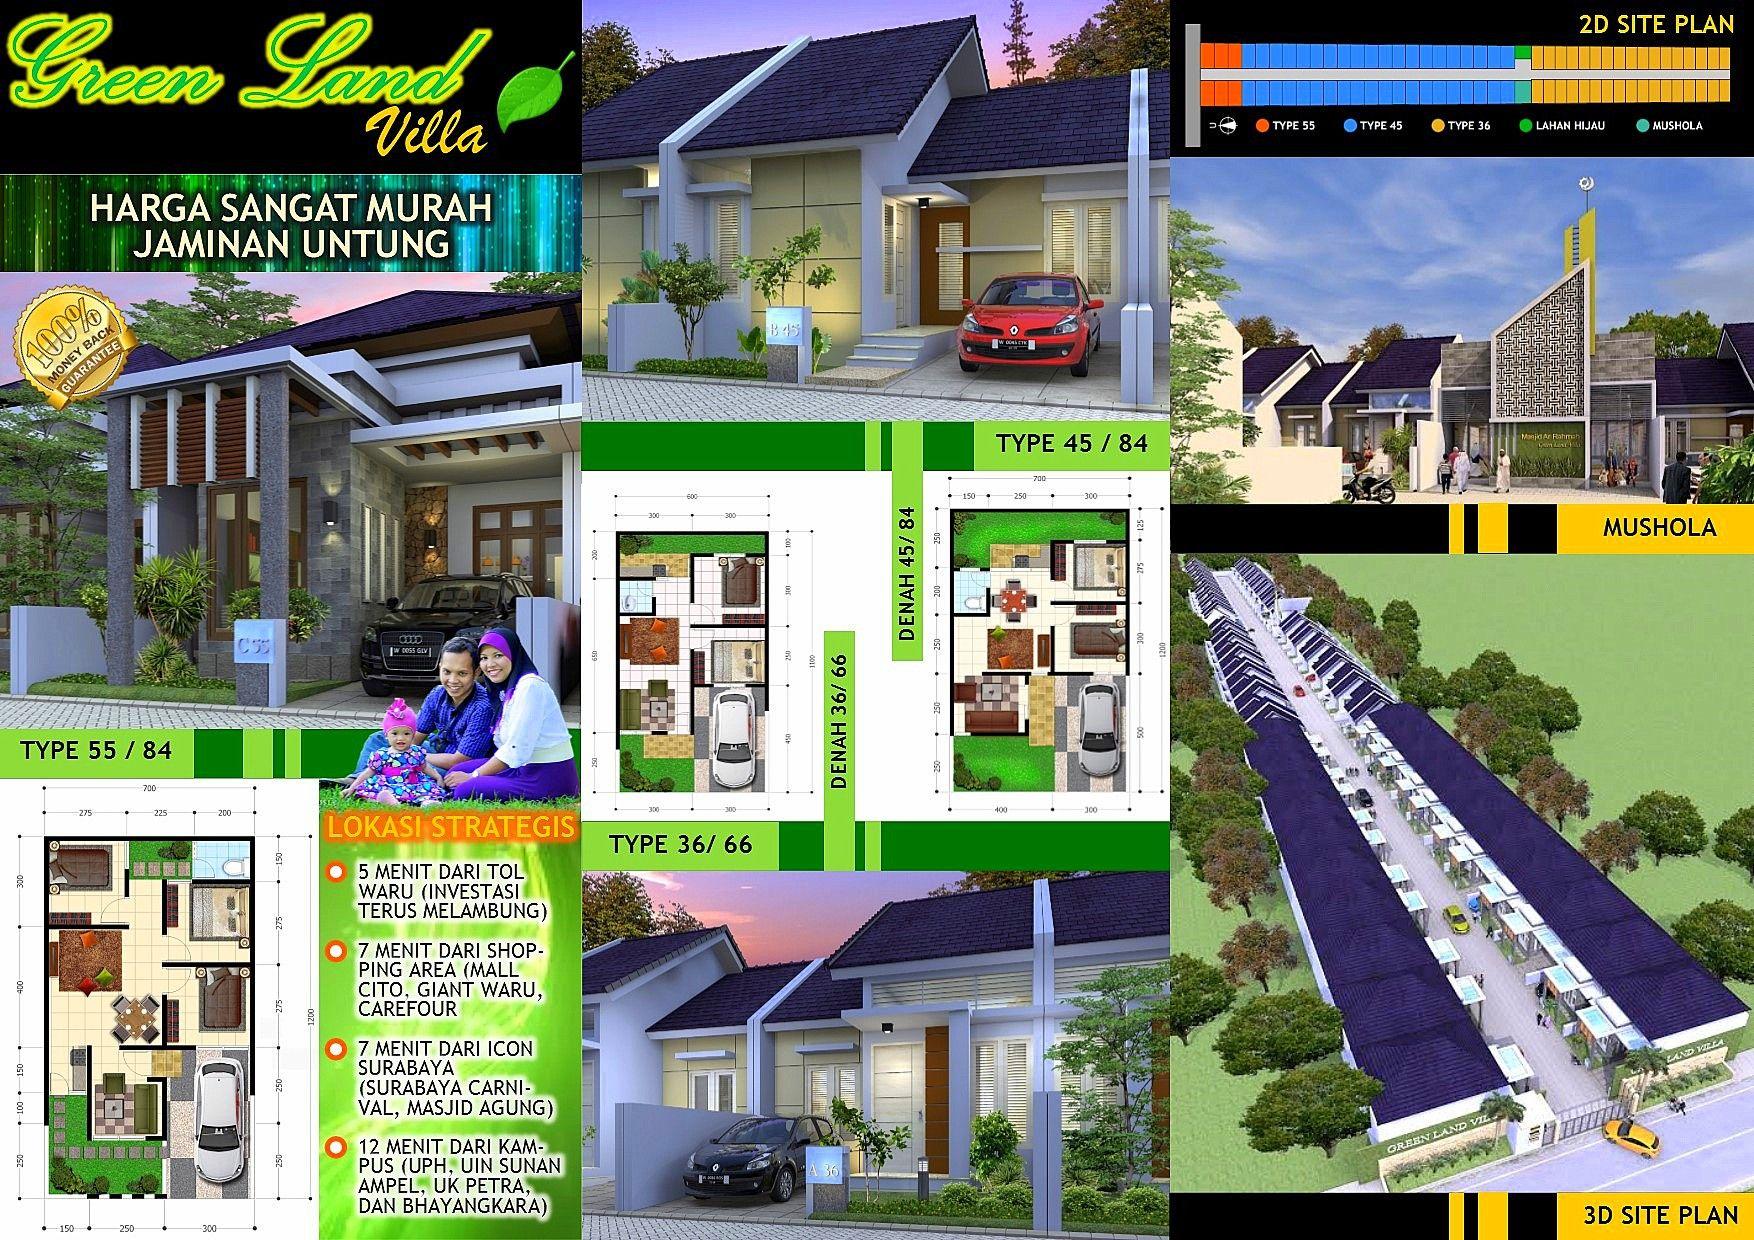 Perumahan Green Land Villa Brosur Perumahan House Design